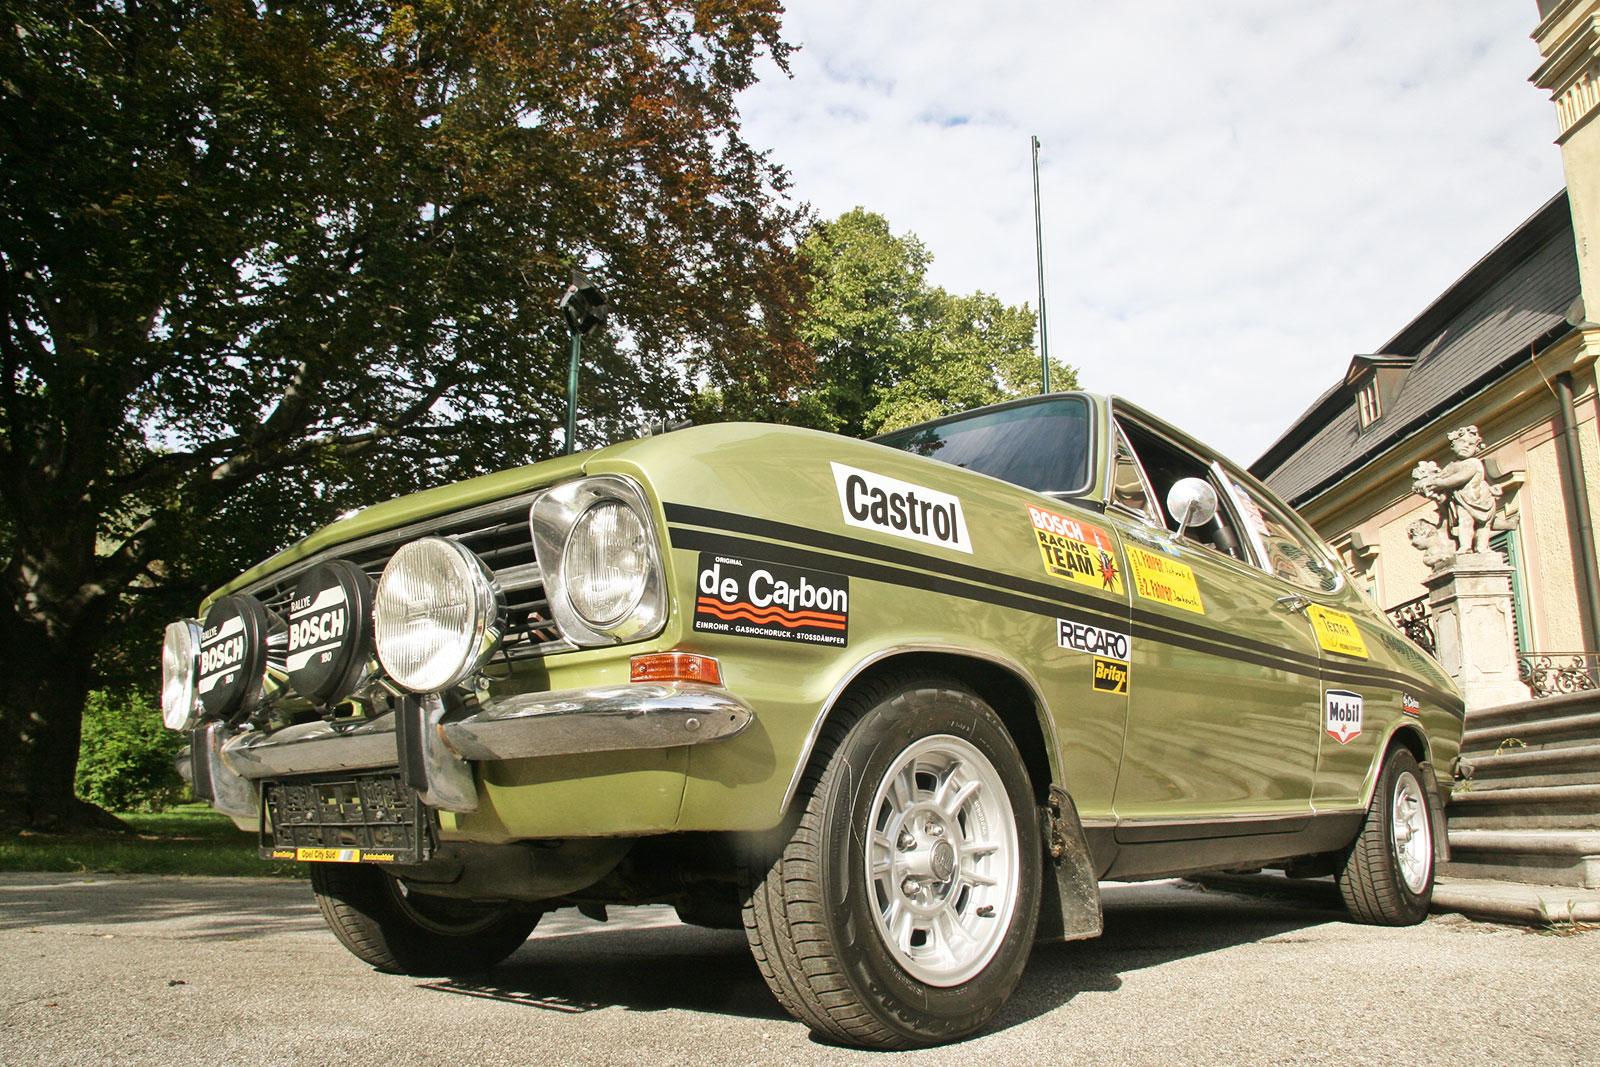 Opel Kadett B The Schwab Collection Vintage Rally Cars